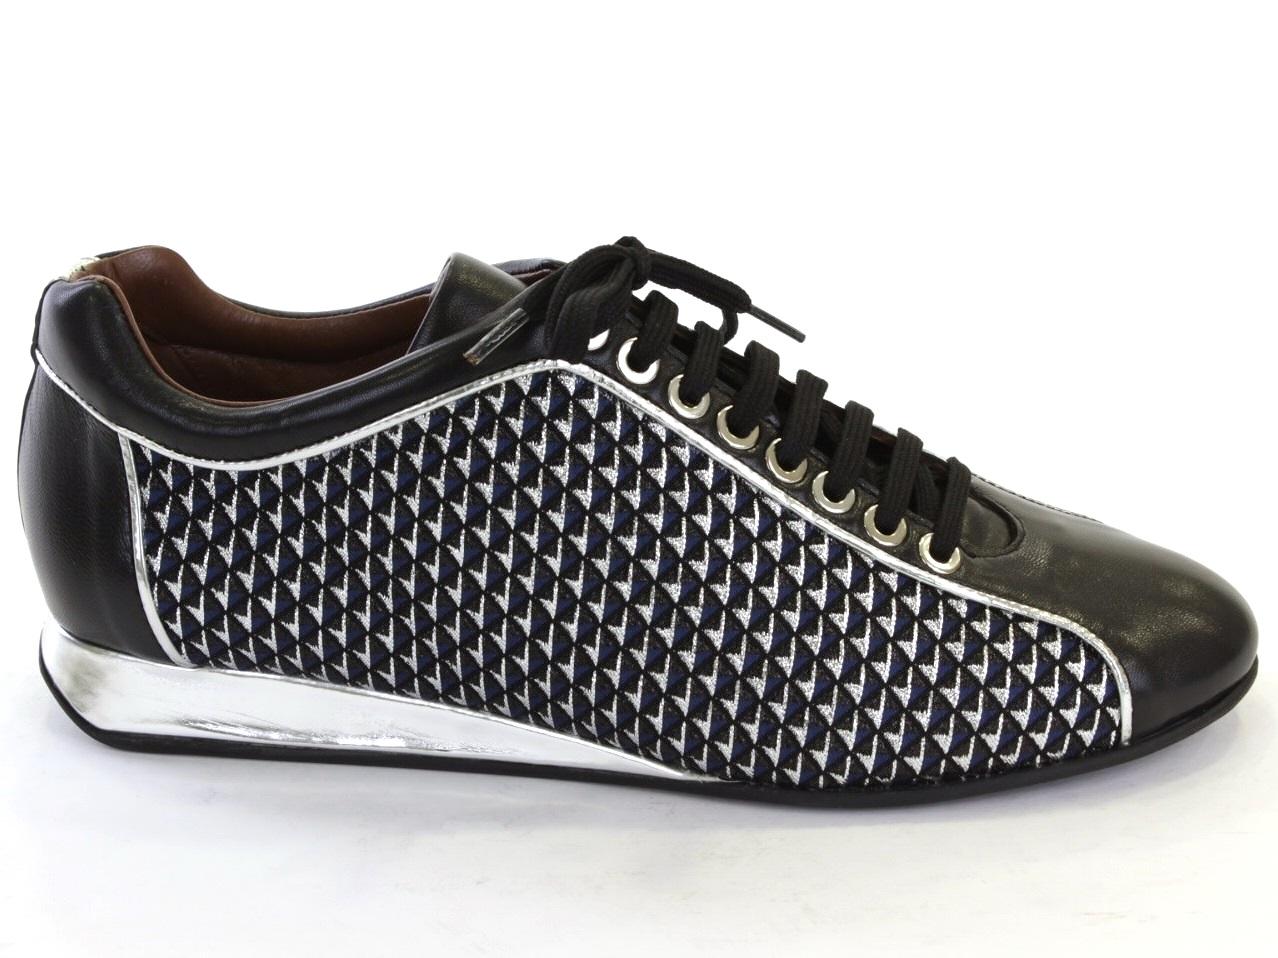 Sneakers and Espadrilles Helsar - 032 11947